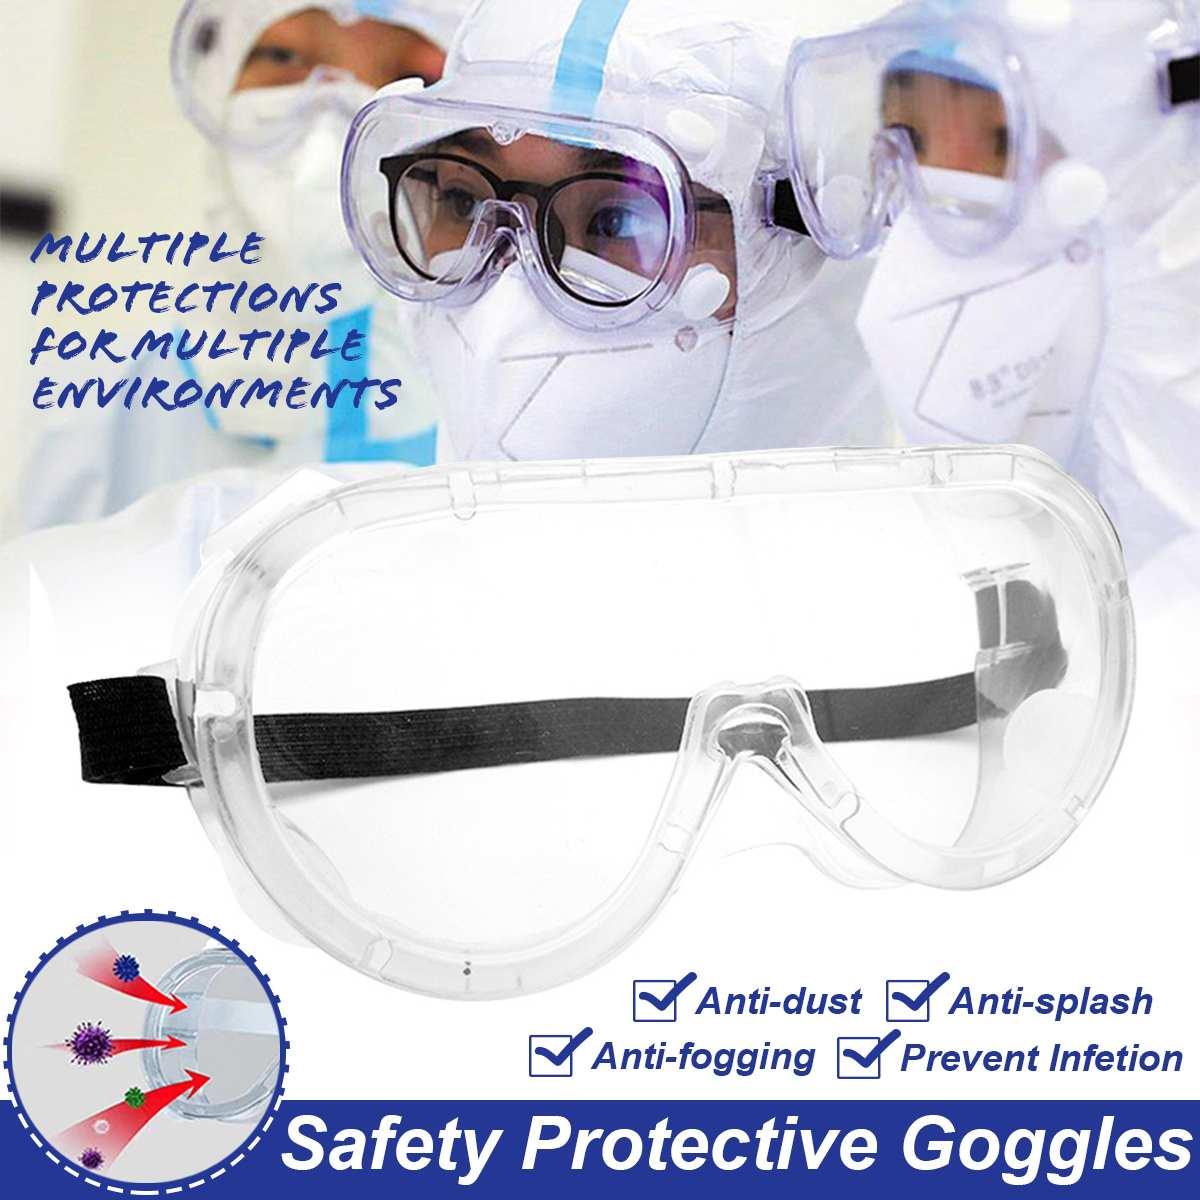 Medical Safety Protective Goggles Glasses Transparent Lens Goggles Prevent Infection Eye Mask Anti-Fog Splash Goggles